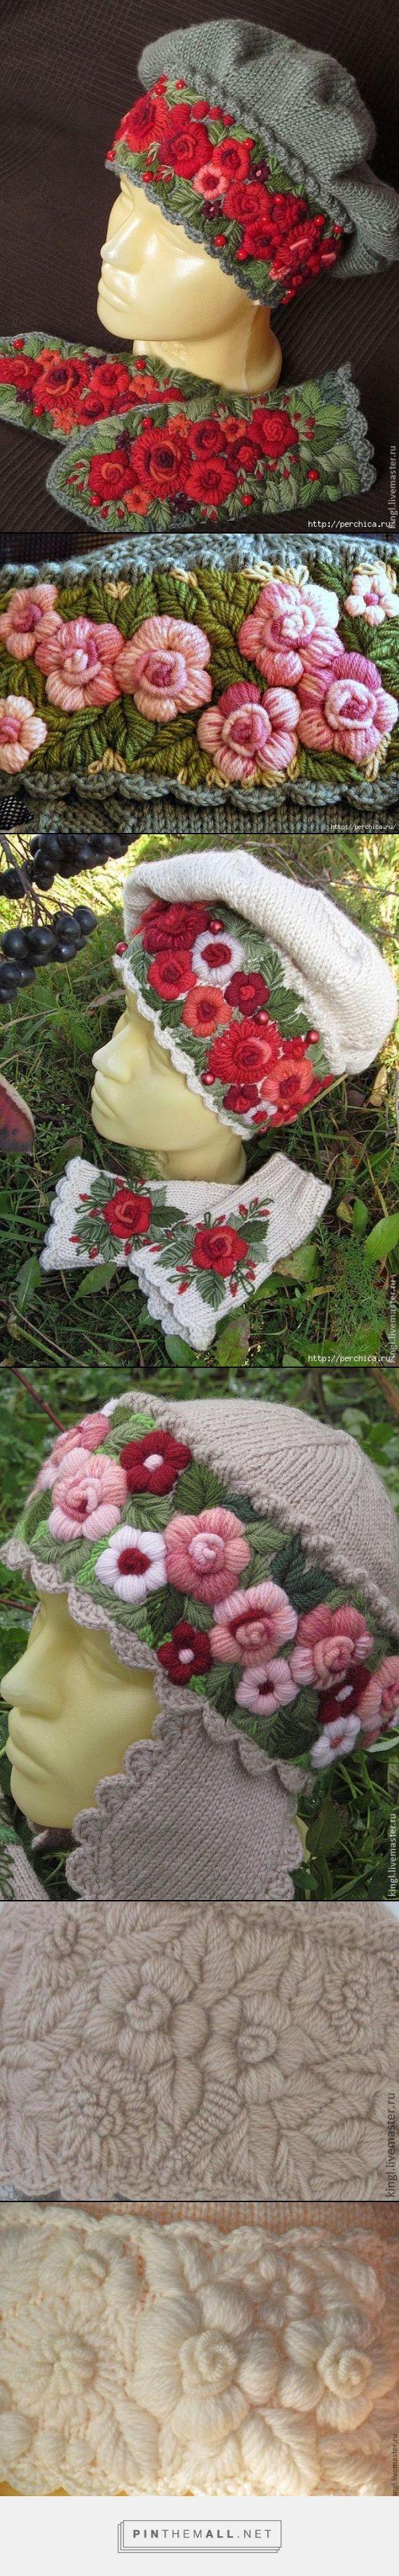 Beautiful embroidered knitting ~~ http://www.liveinternet.ru/users/3344739/post317465962/